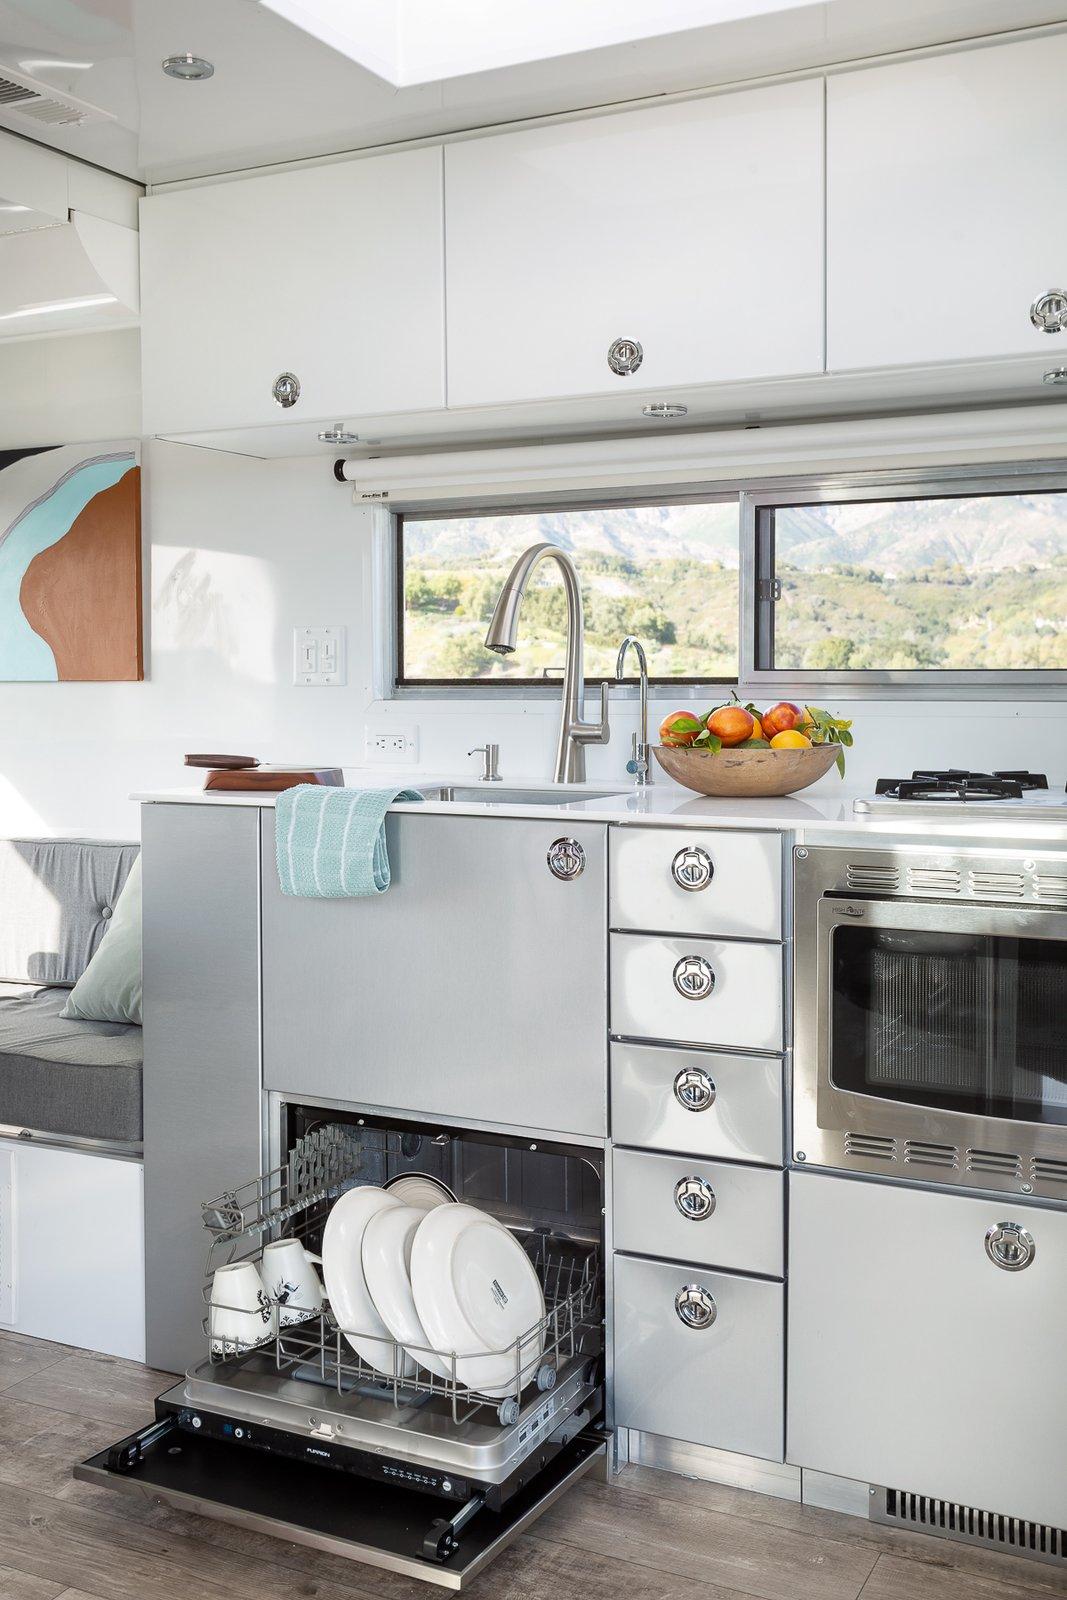 Living Vehicle 2020 Trailer kitchen